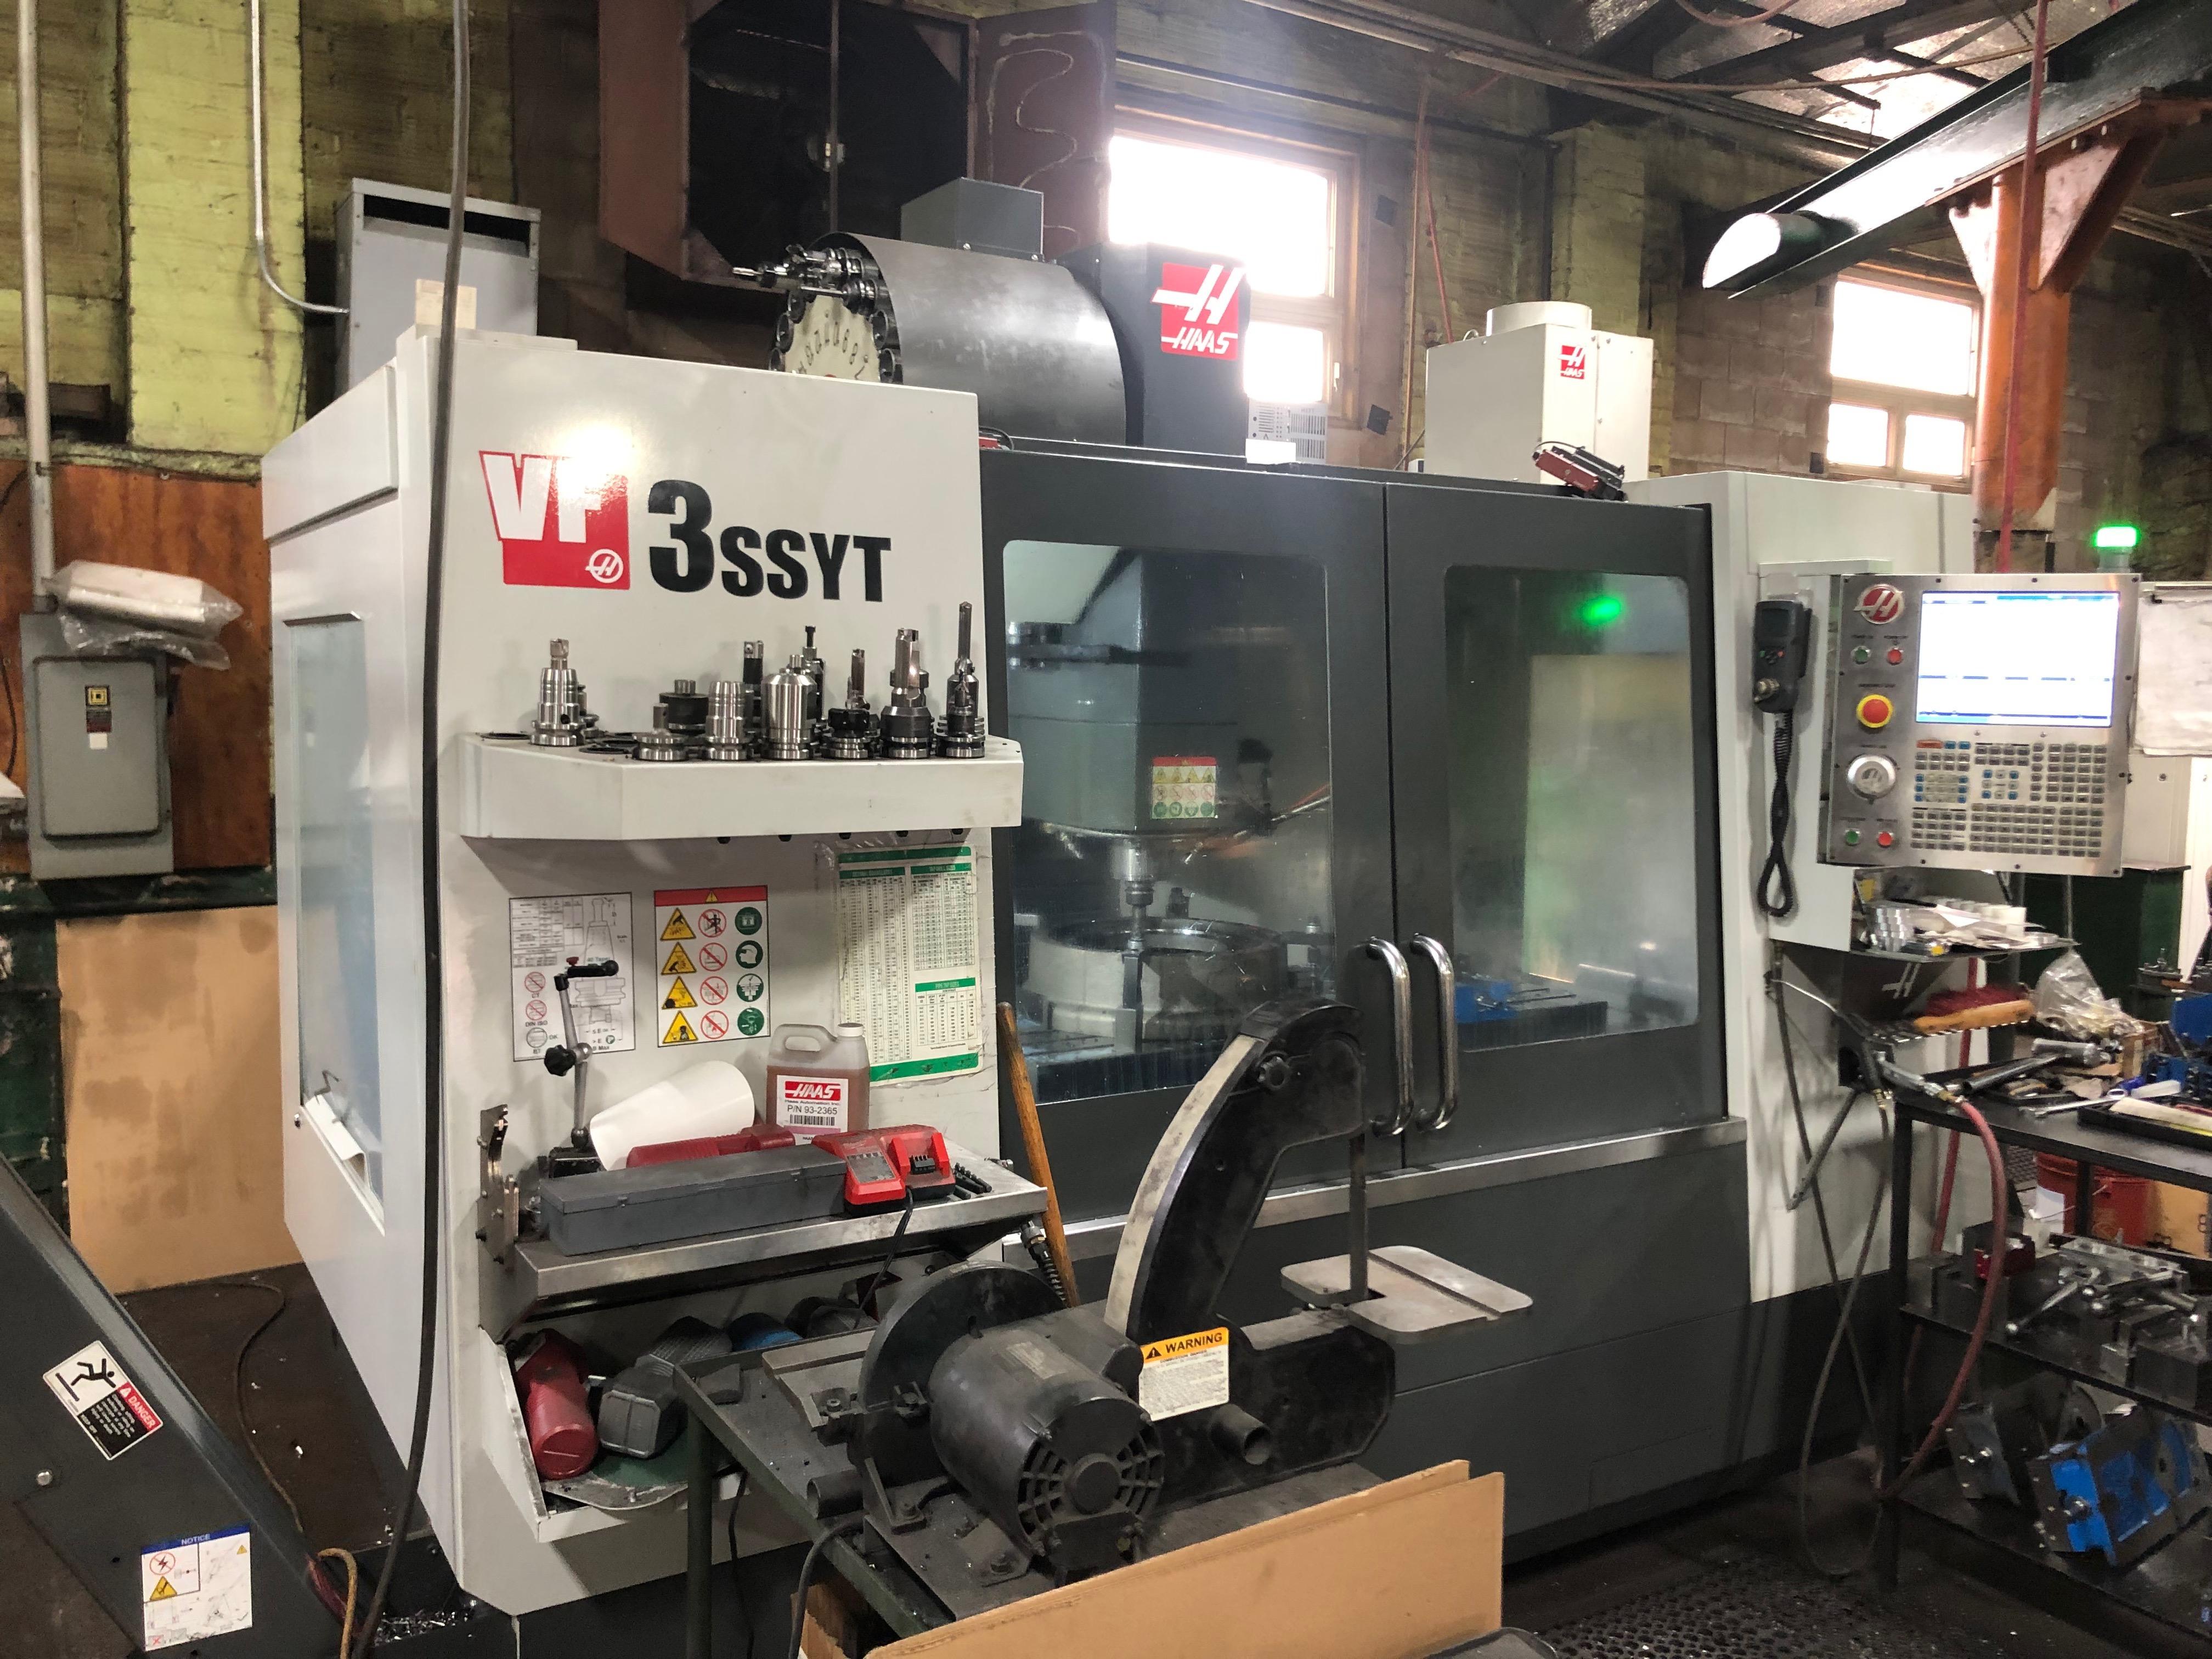 Haas VF3SSTY CNC MIll